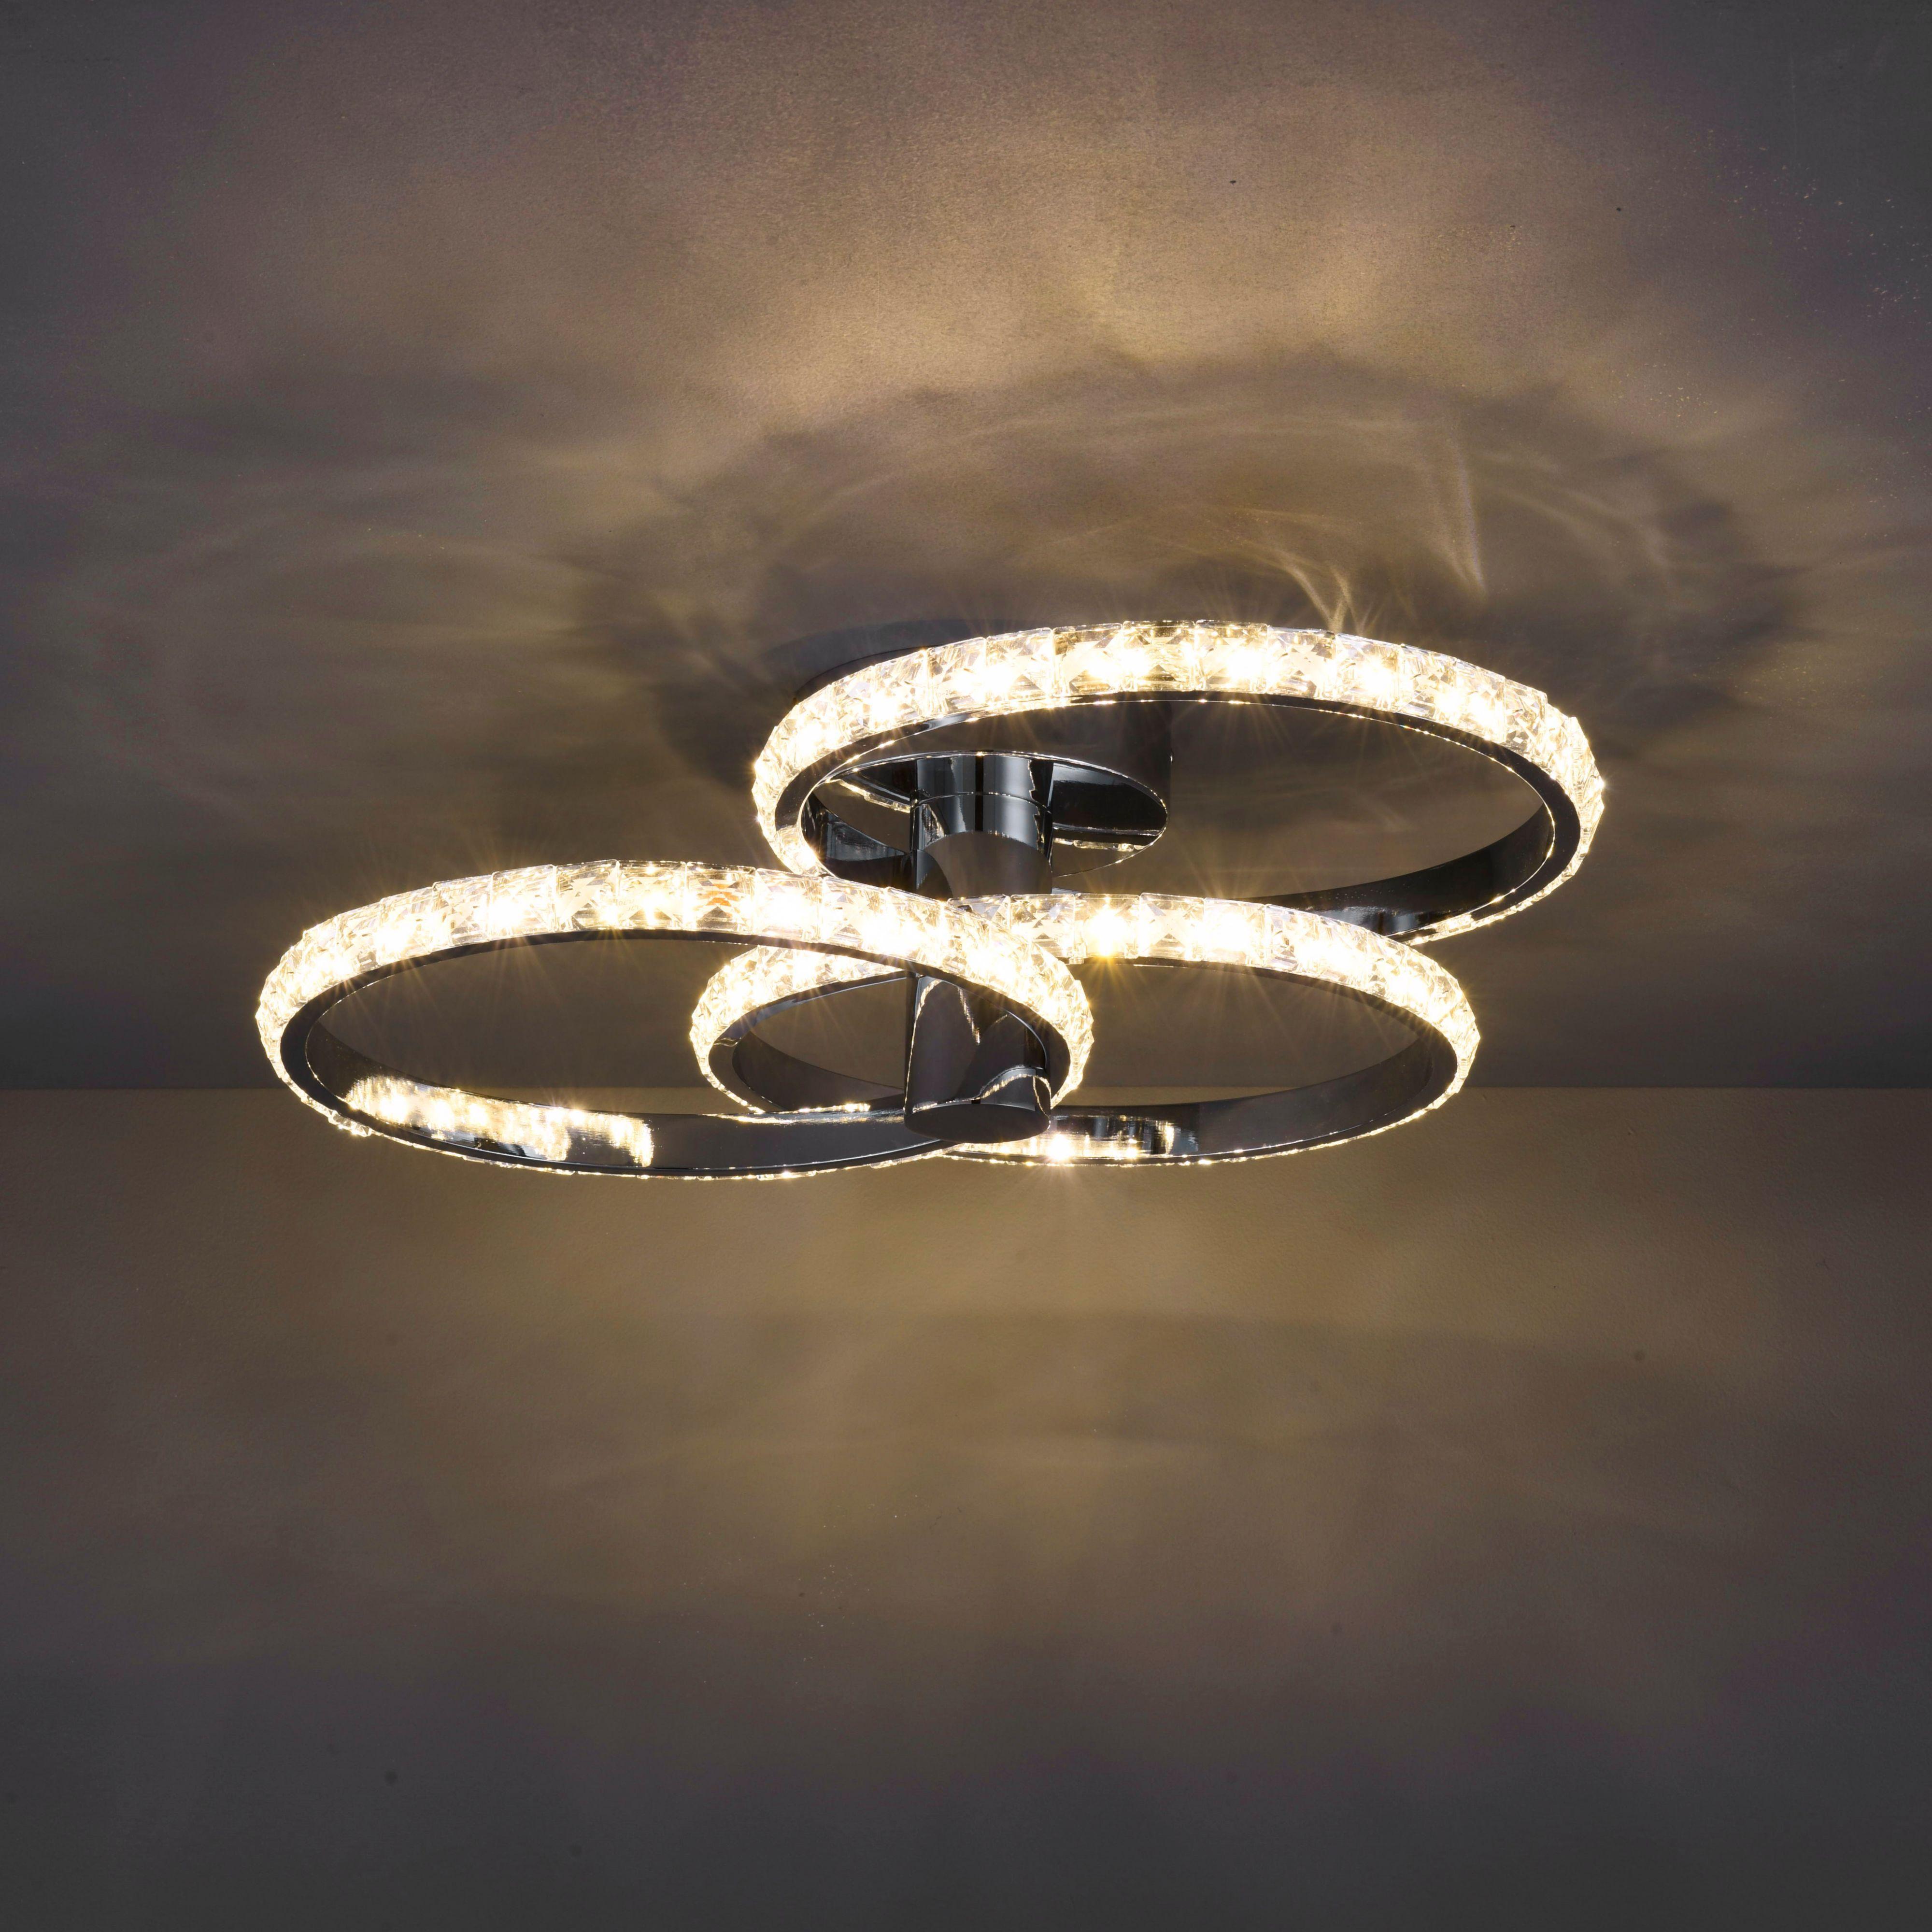 Aura Brushed Chrome Effect 3 Lamp Ceiling Light Departments Diy At B Q